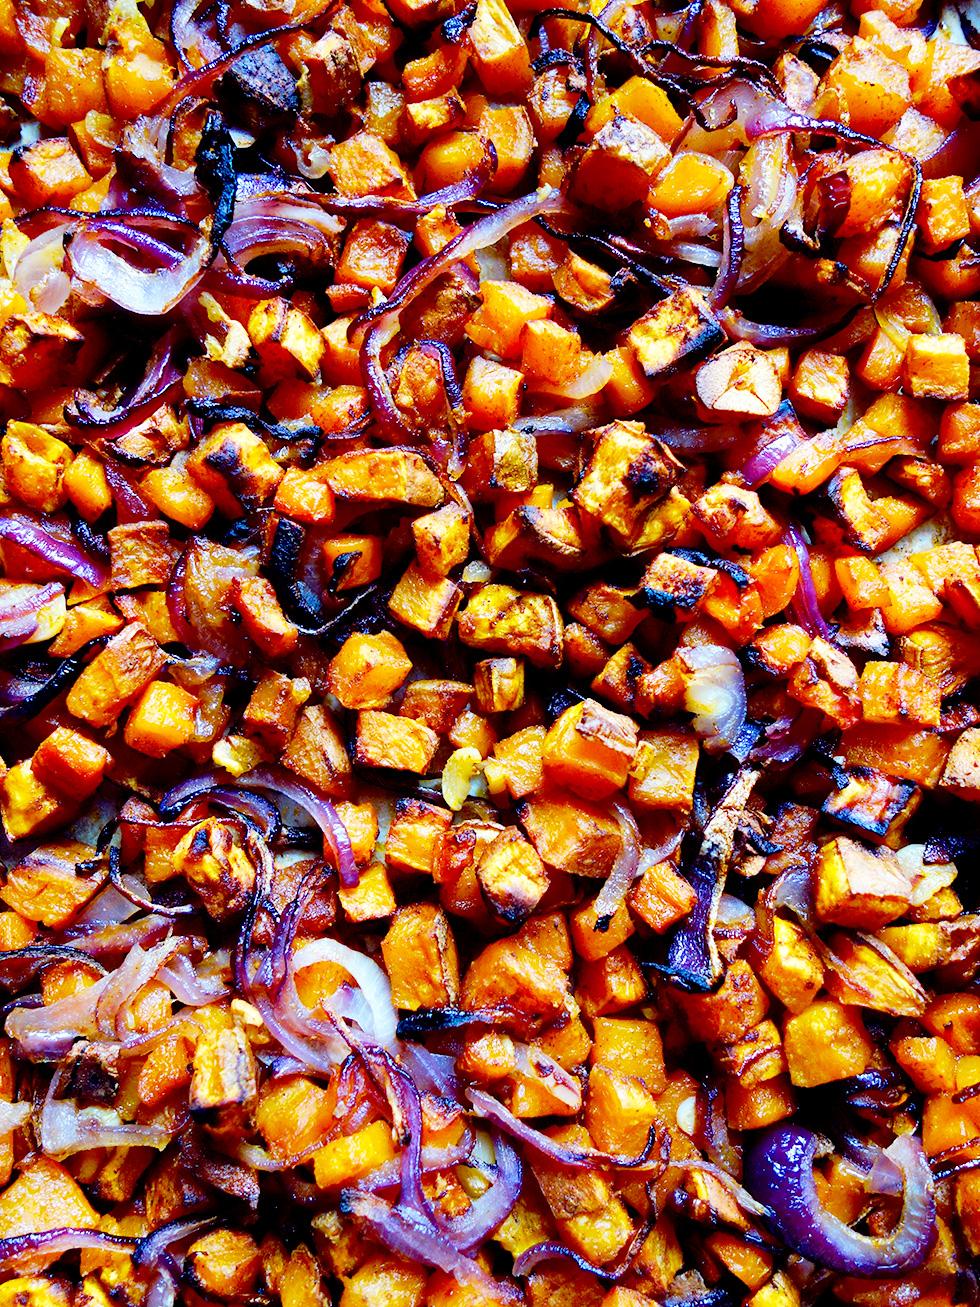 Anytime Sweet Potato, Carrot, Onion and Garlic Hash